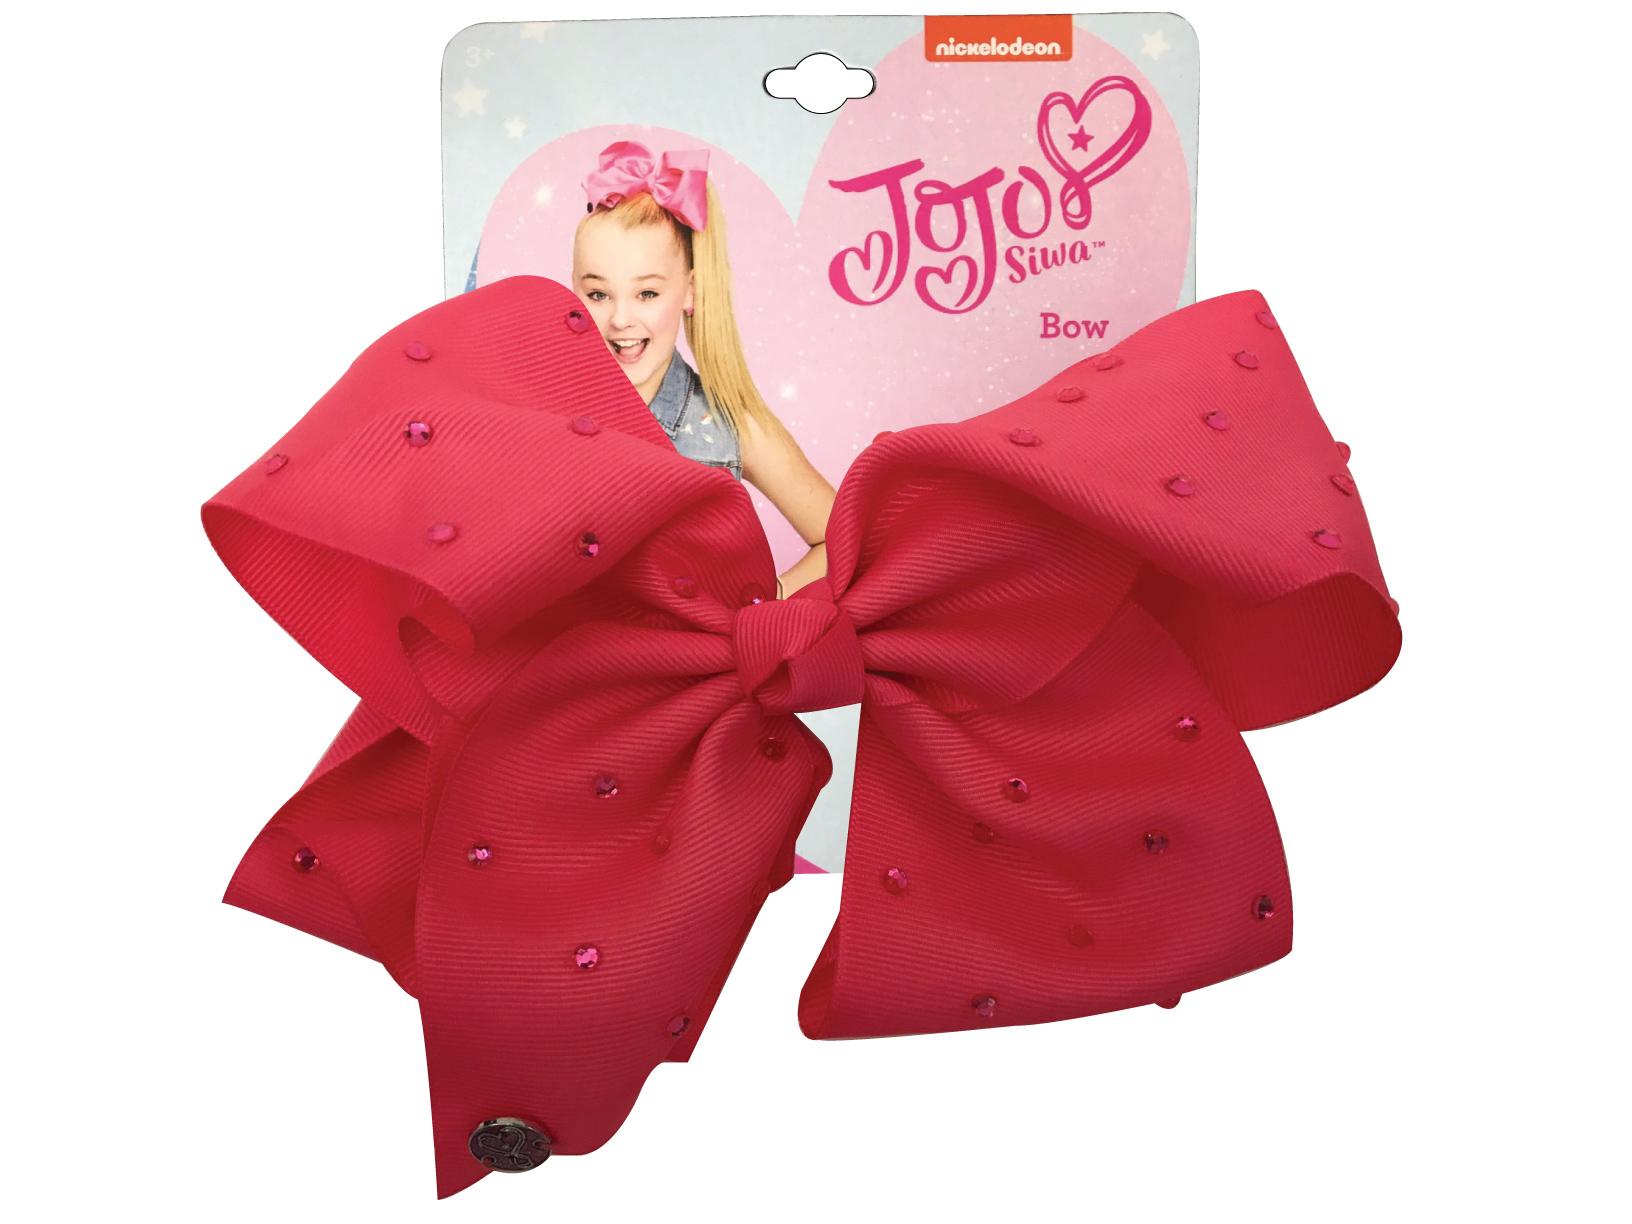 JoJo Siwa Large Cheer Hair Bow (Coral Pink w/Rhinestones)